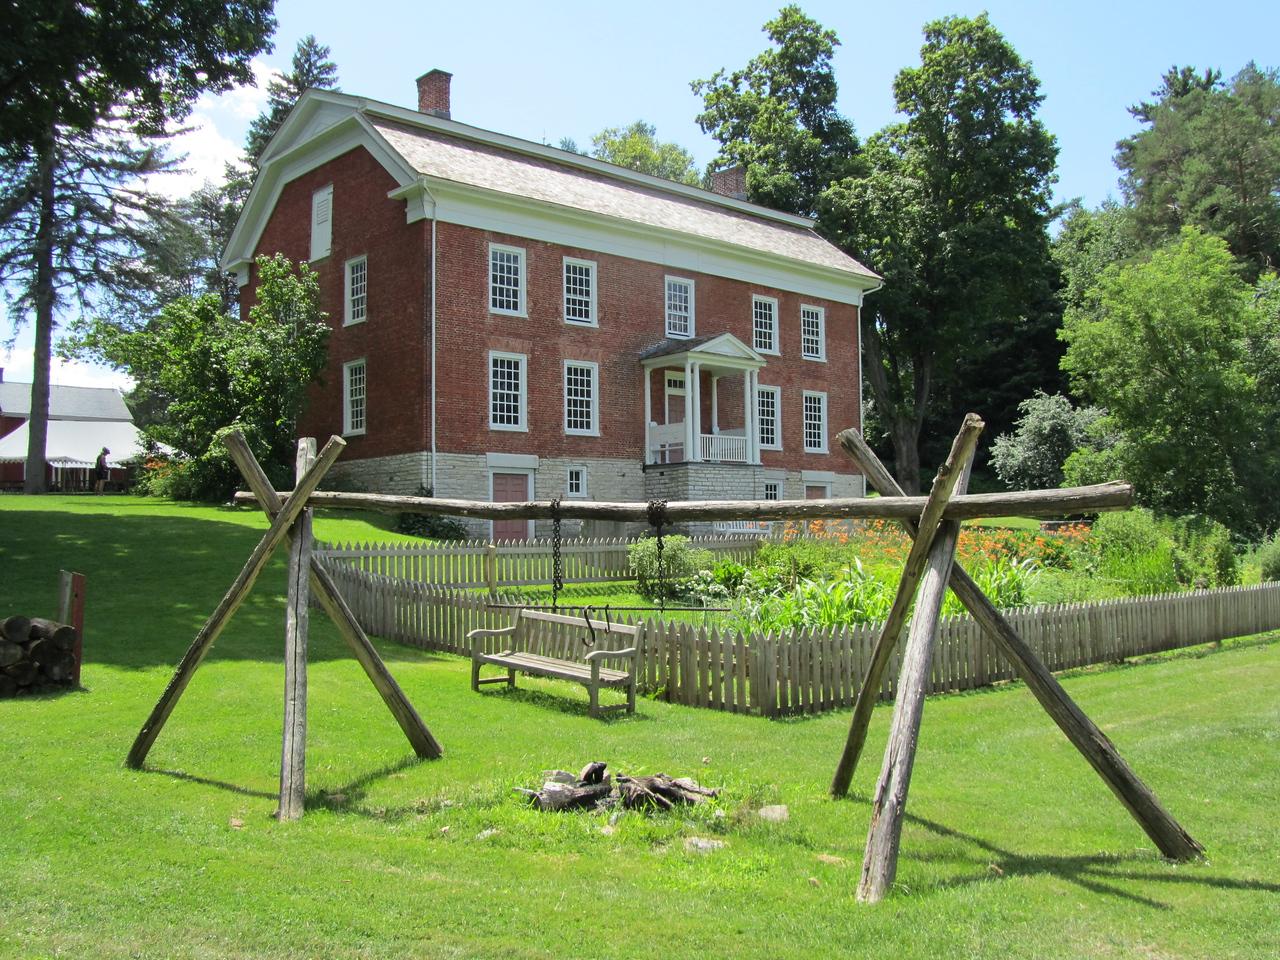 General Herkimer homestead.